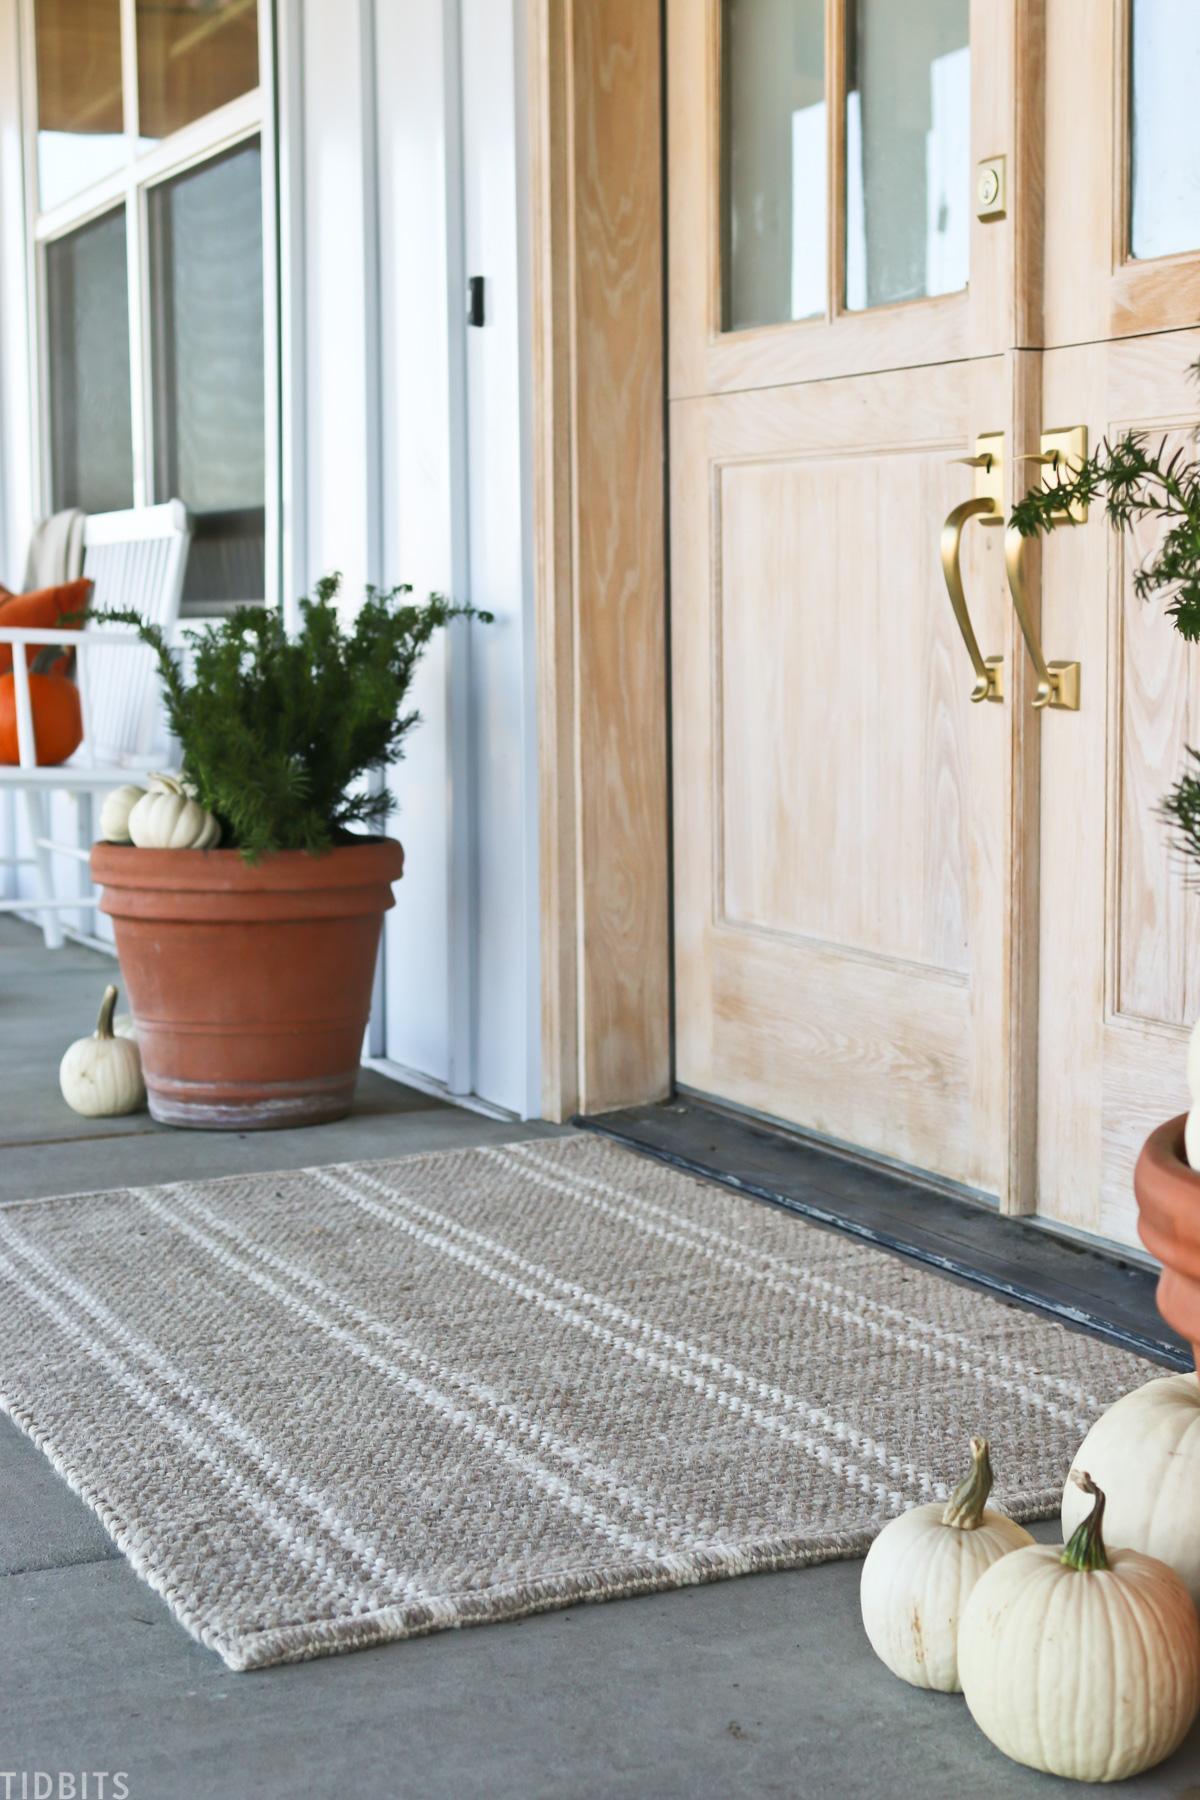 decorative striped rug in front of front door